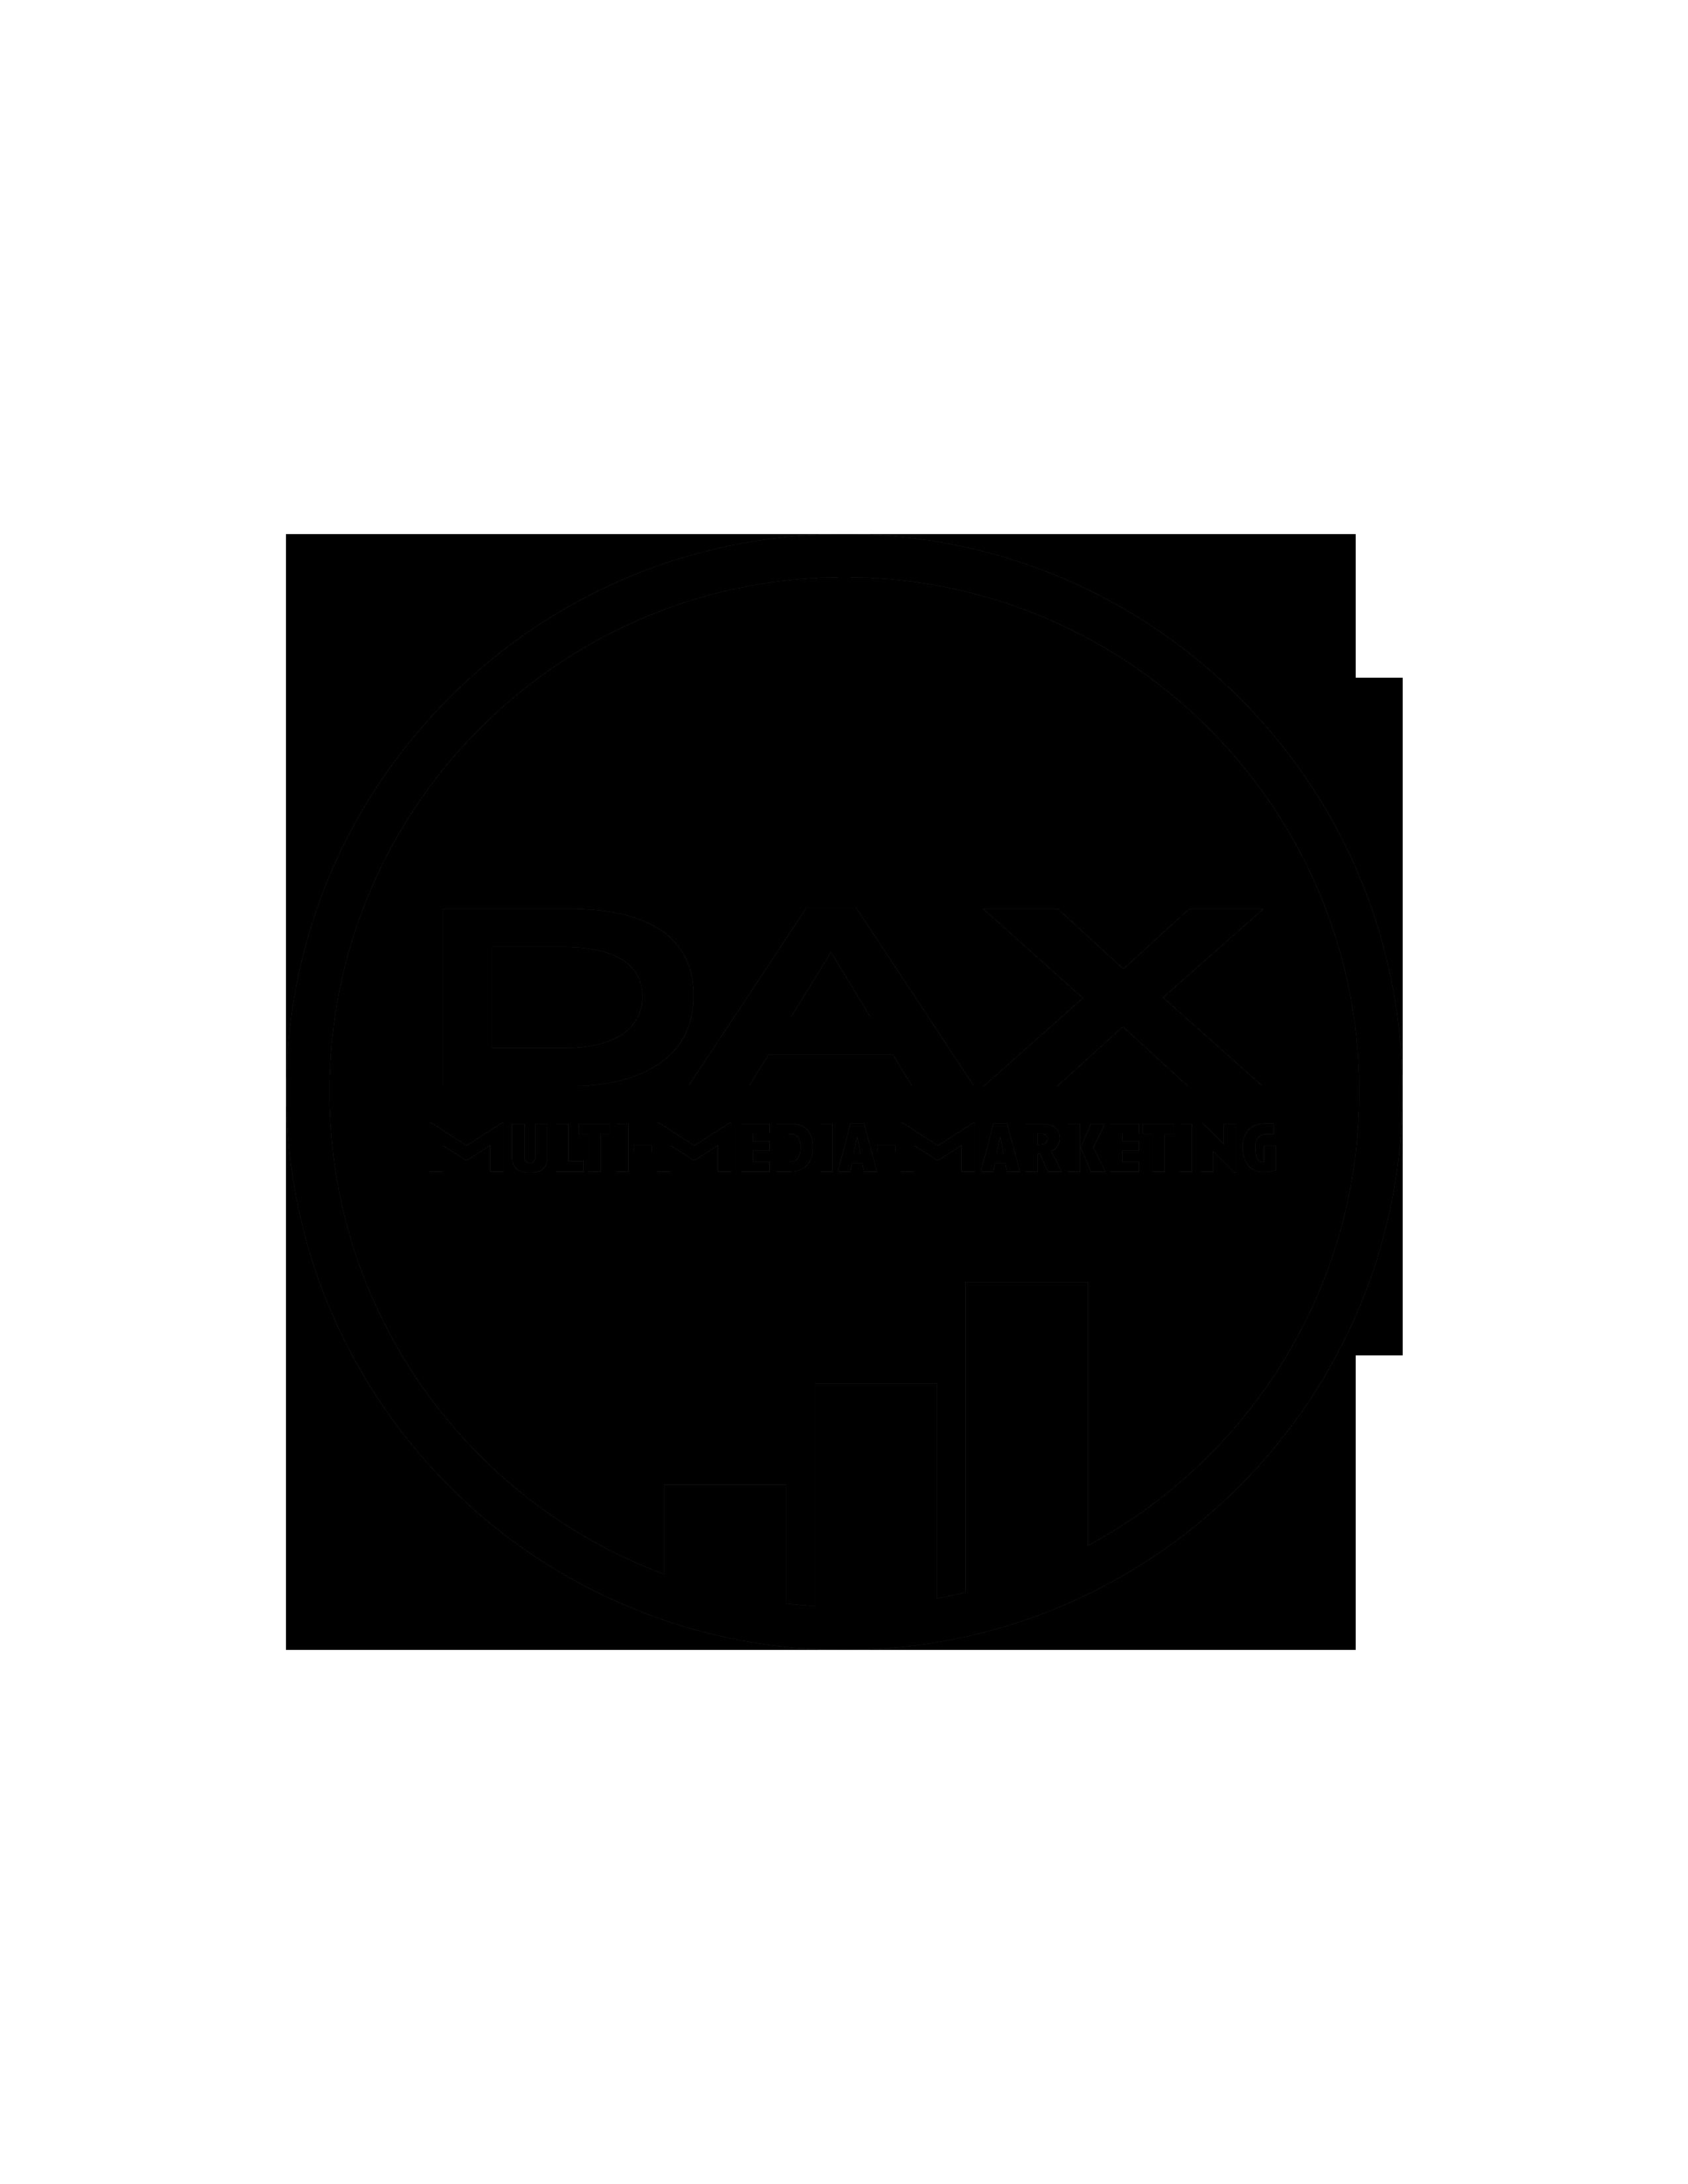 Show profile for daxmarketing